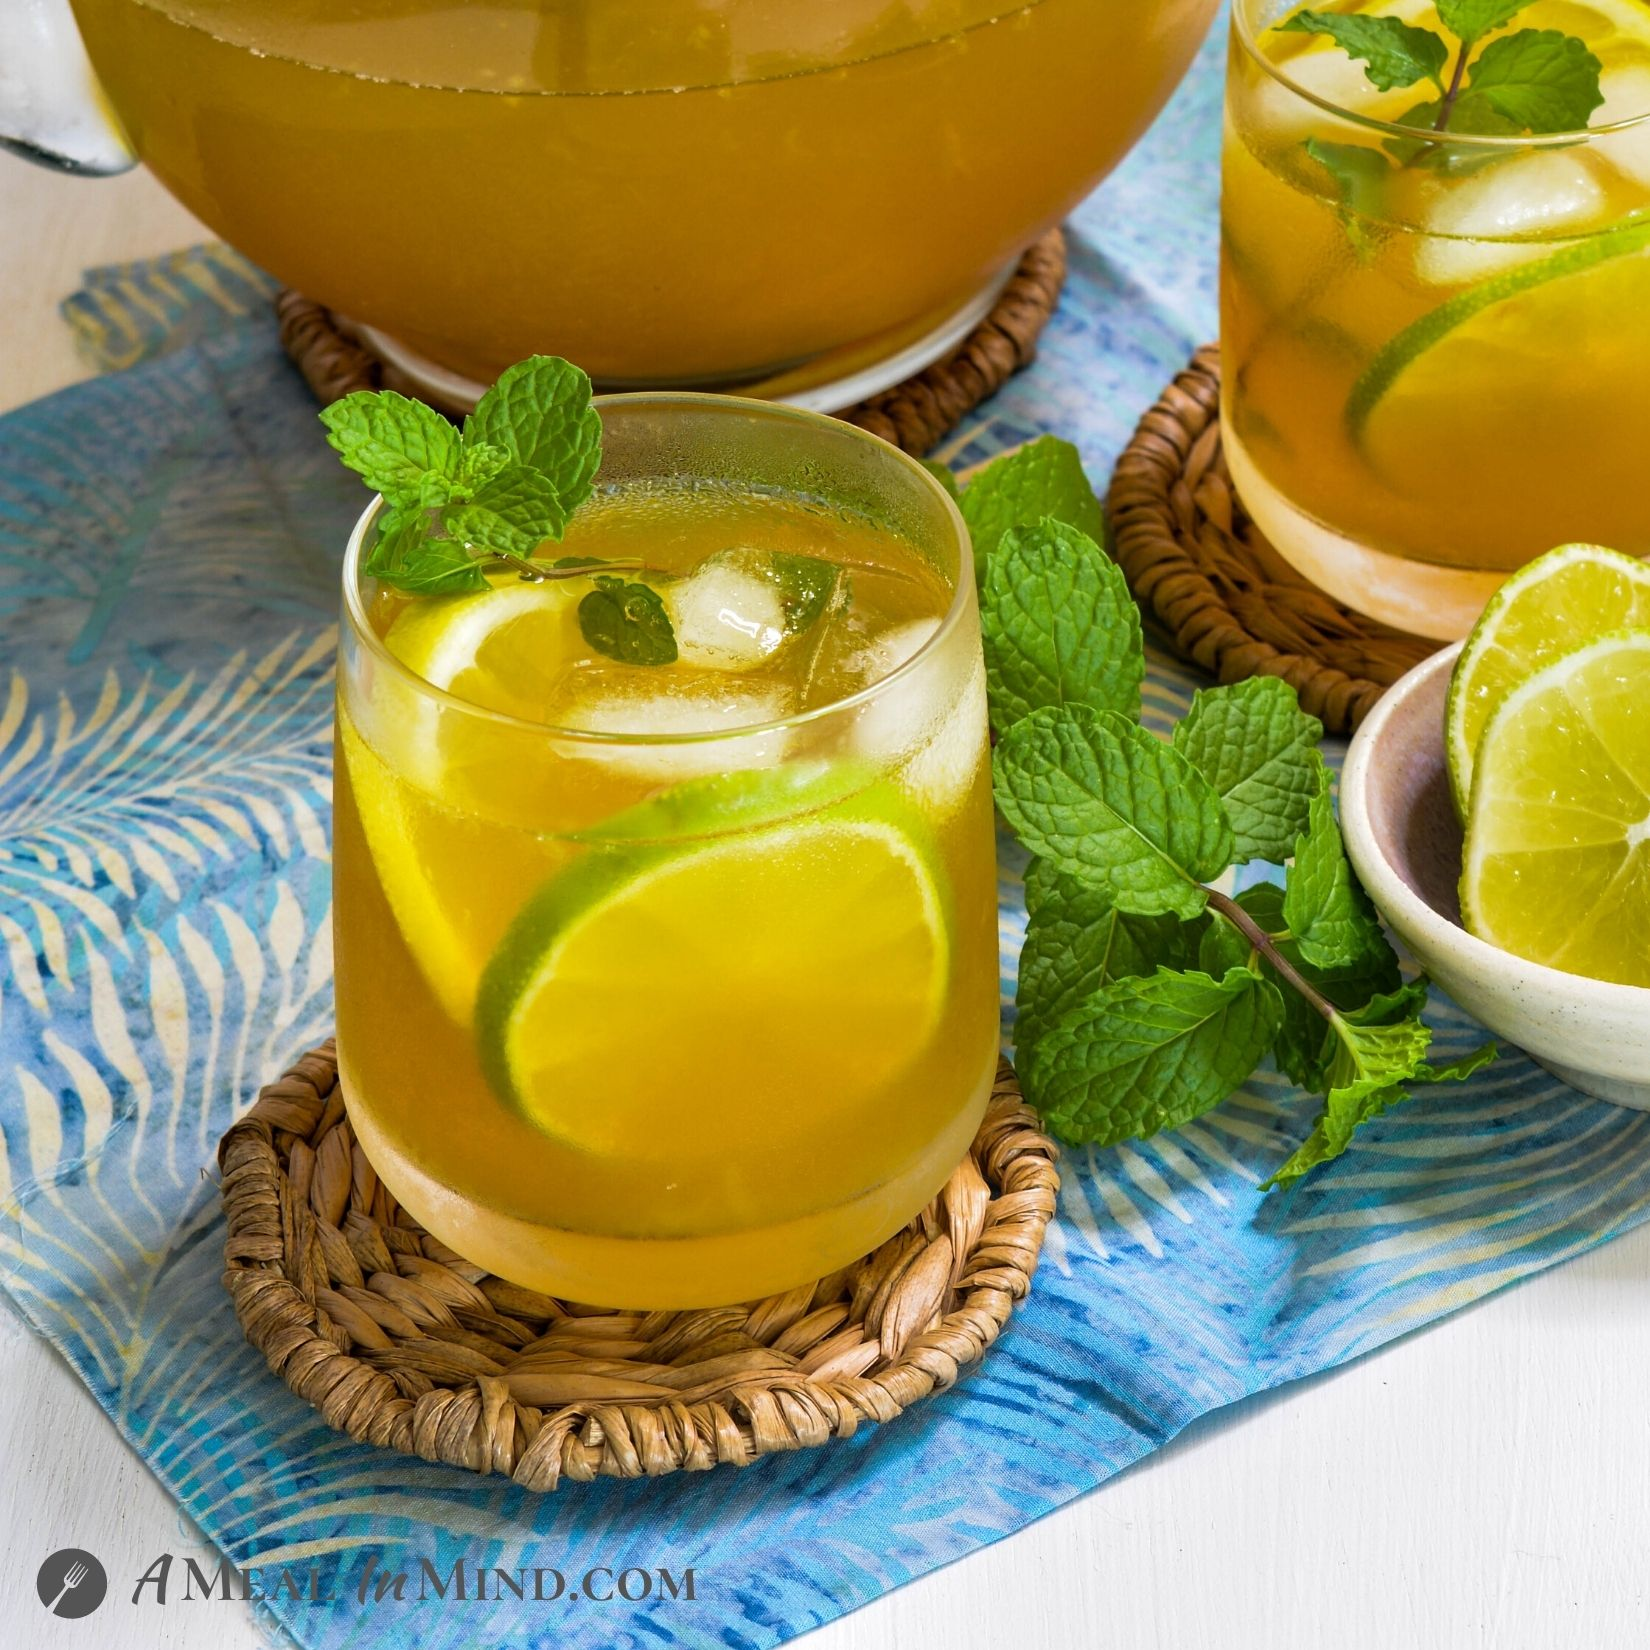 Turmeric-Ginger Lemon Tea close up of garnished glass of tea